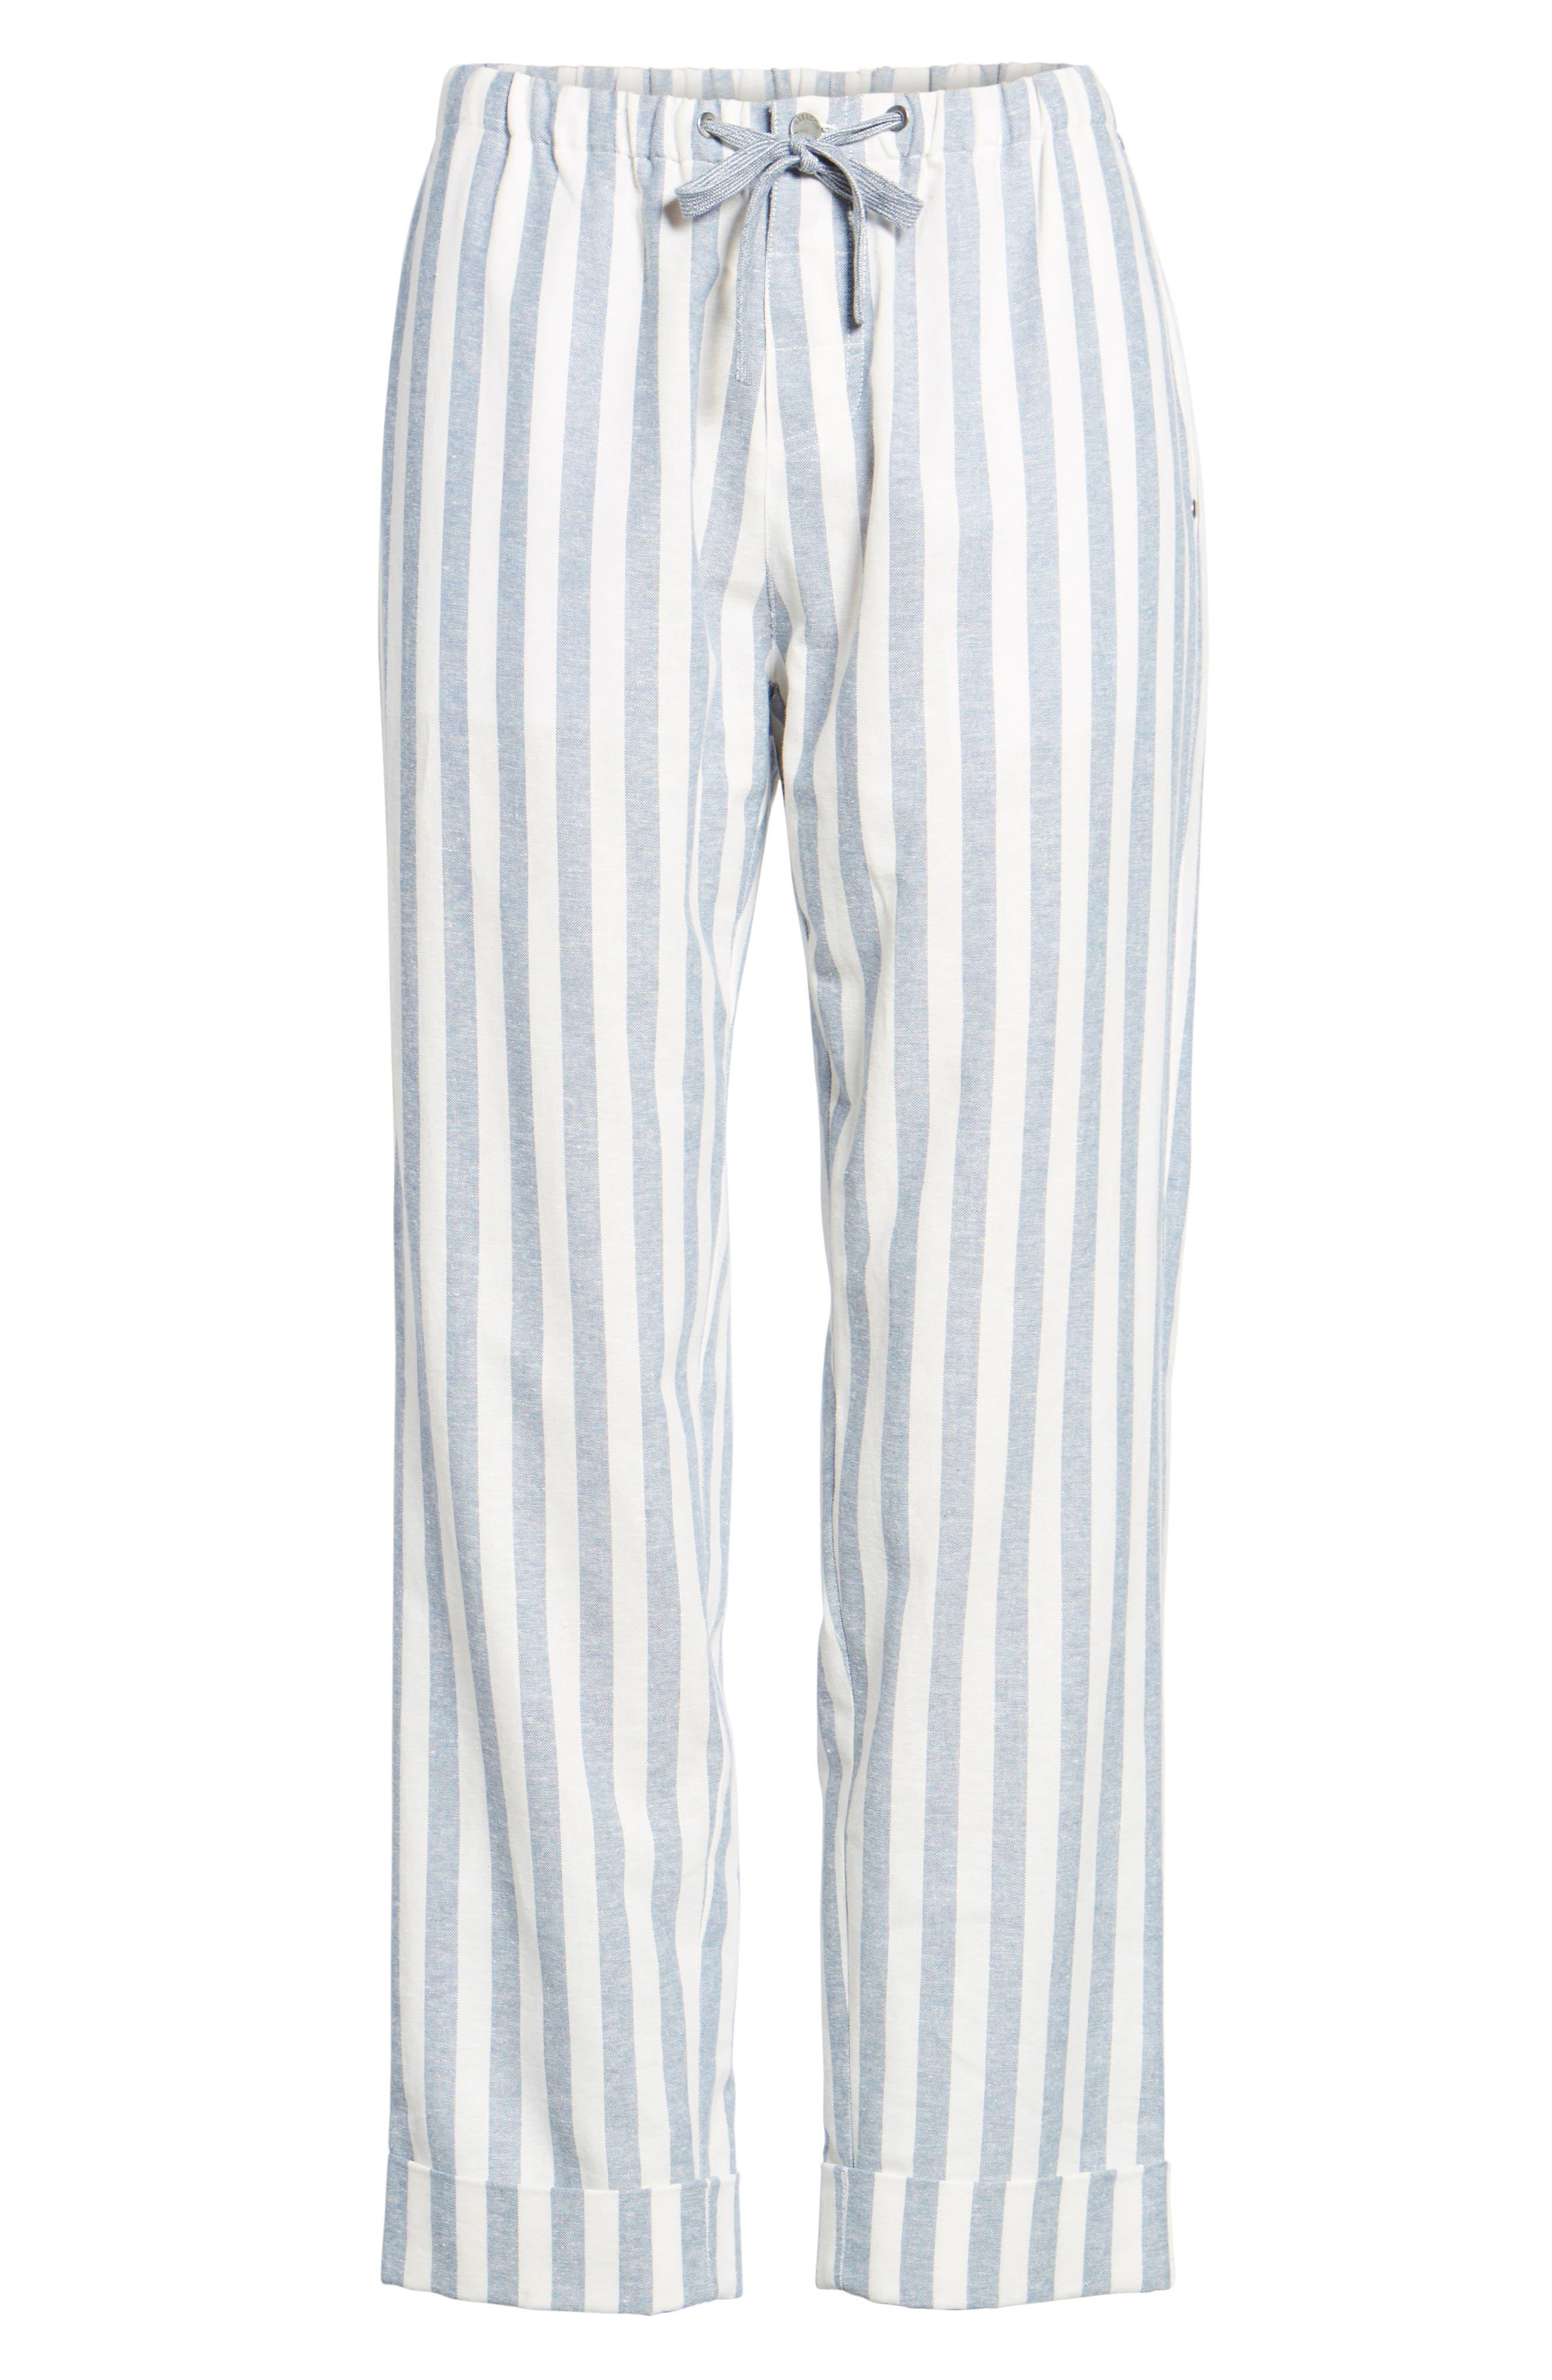 Vera Drawstring Pants,                             Alternate thumbnail 6, color,                             101